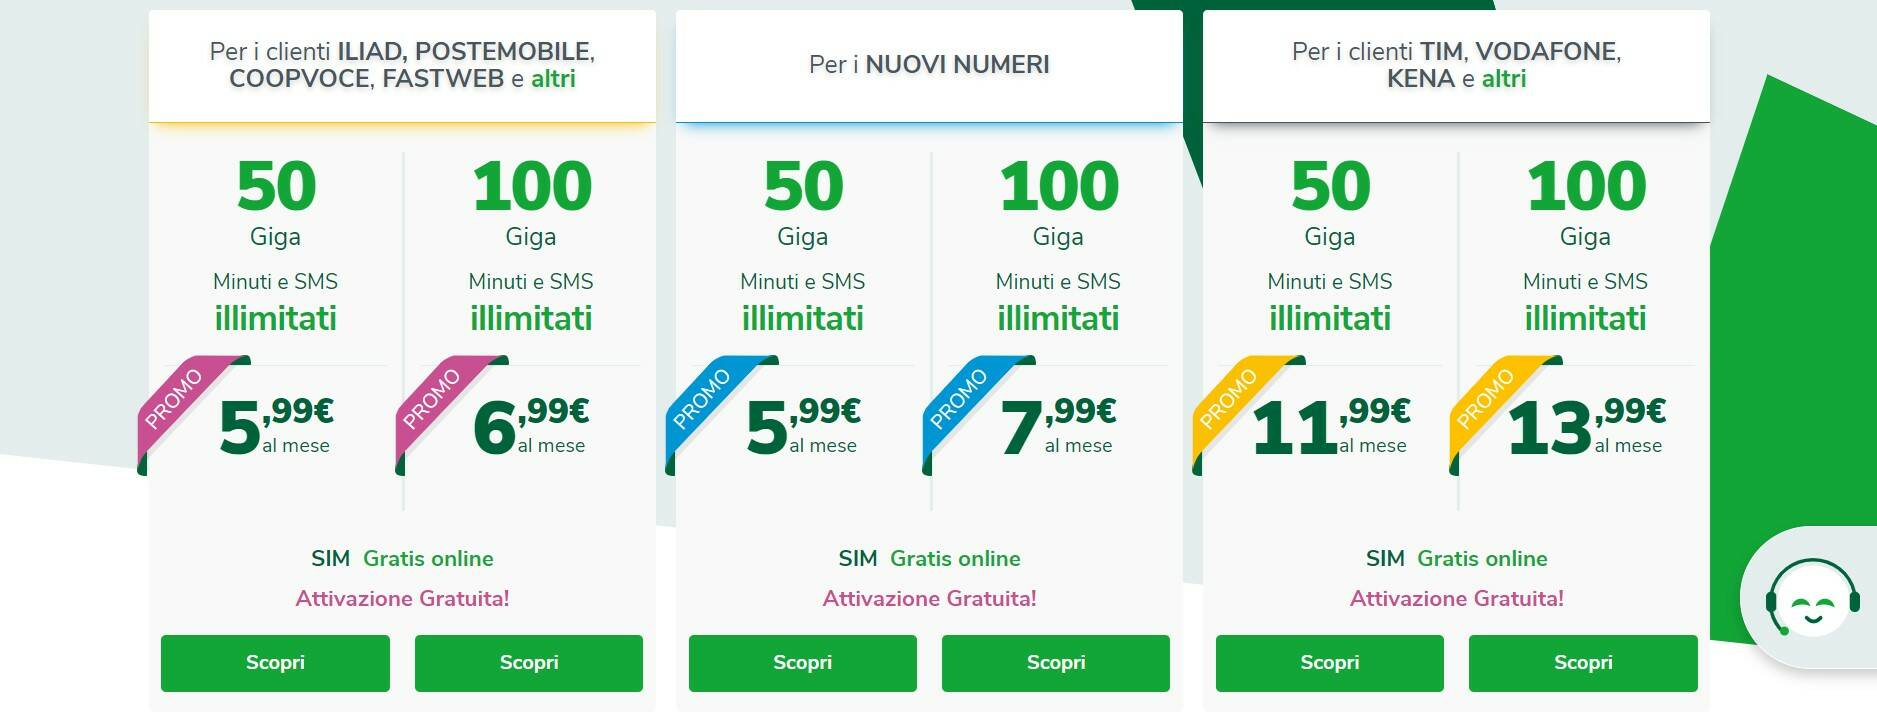 offerta_very-mobile